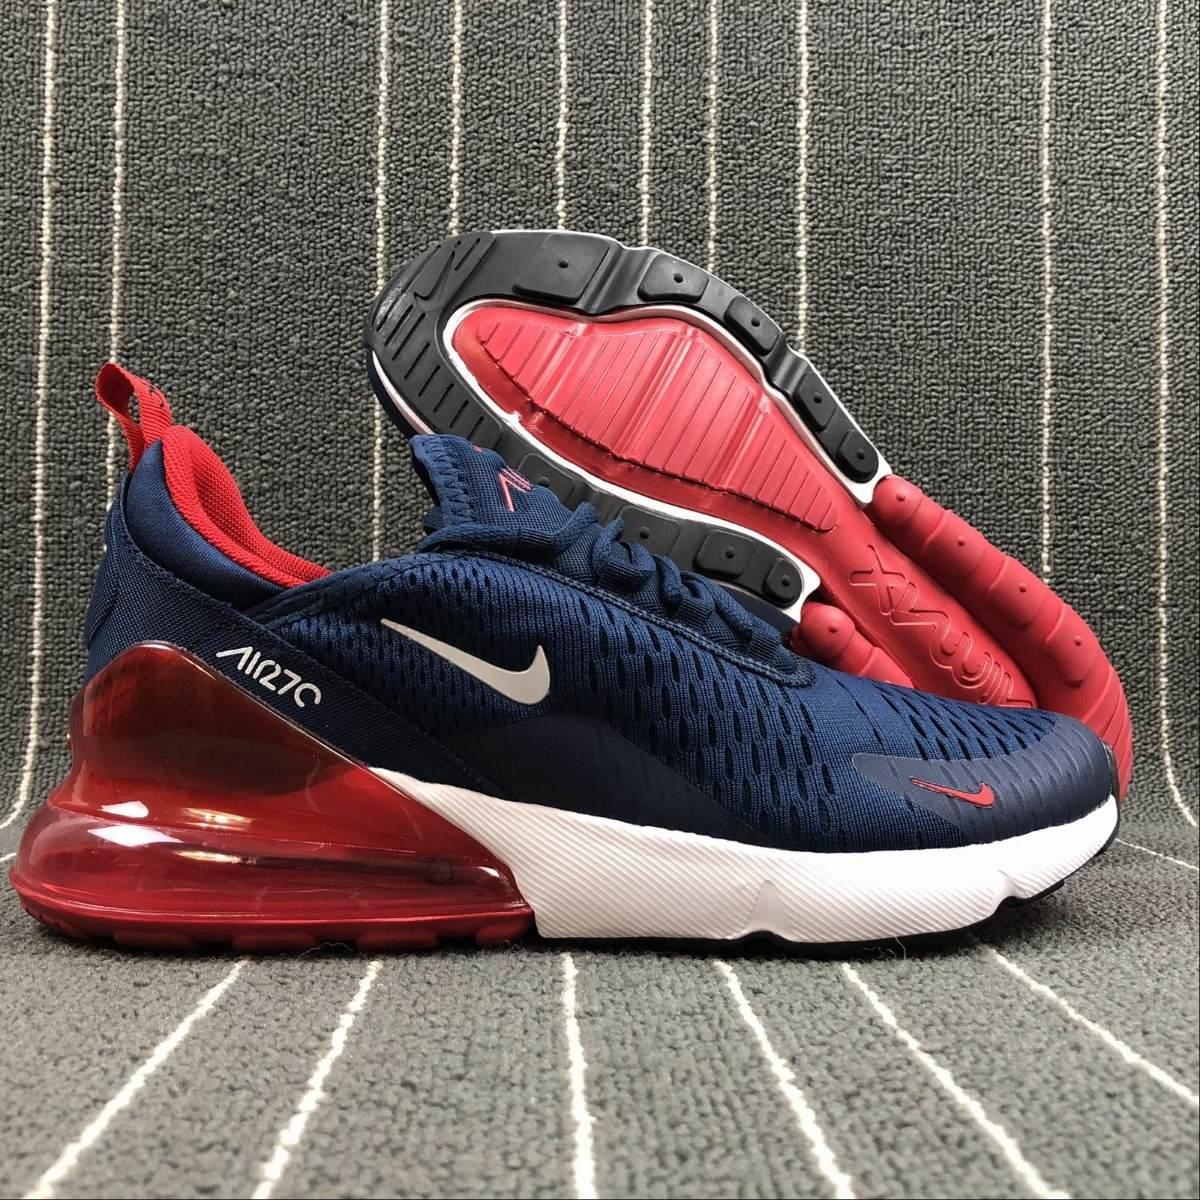 Zapatillas Nike Air Max 270 Navy red 36 39 Exclusive Line